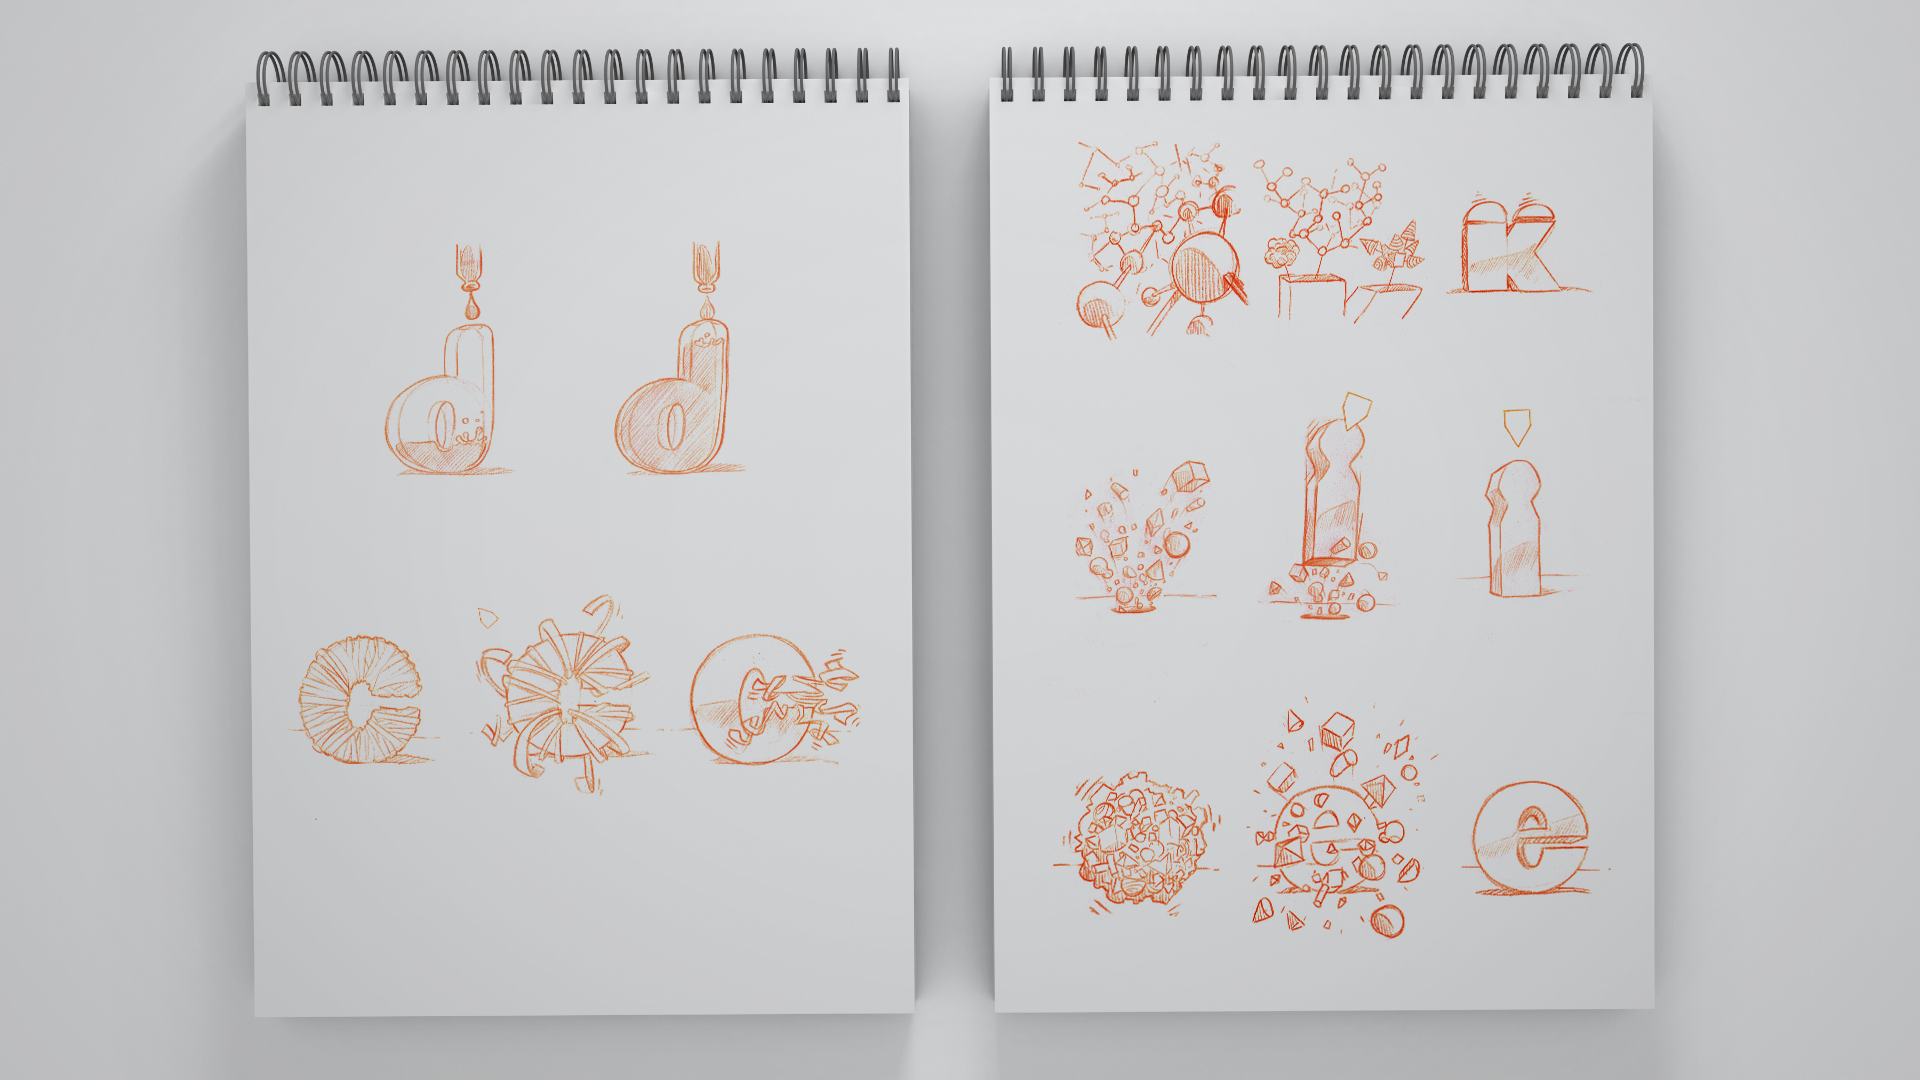 Nick_Sketch_2